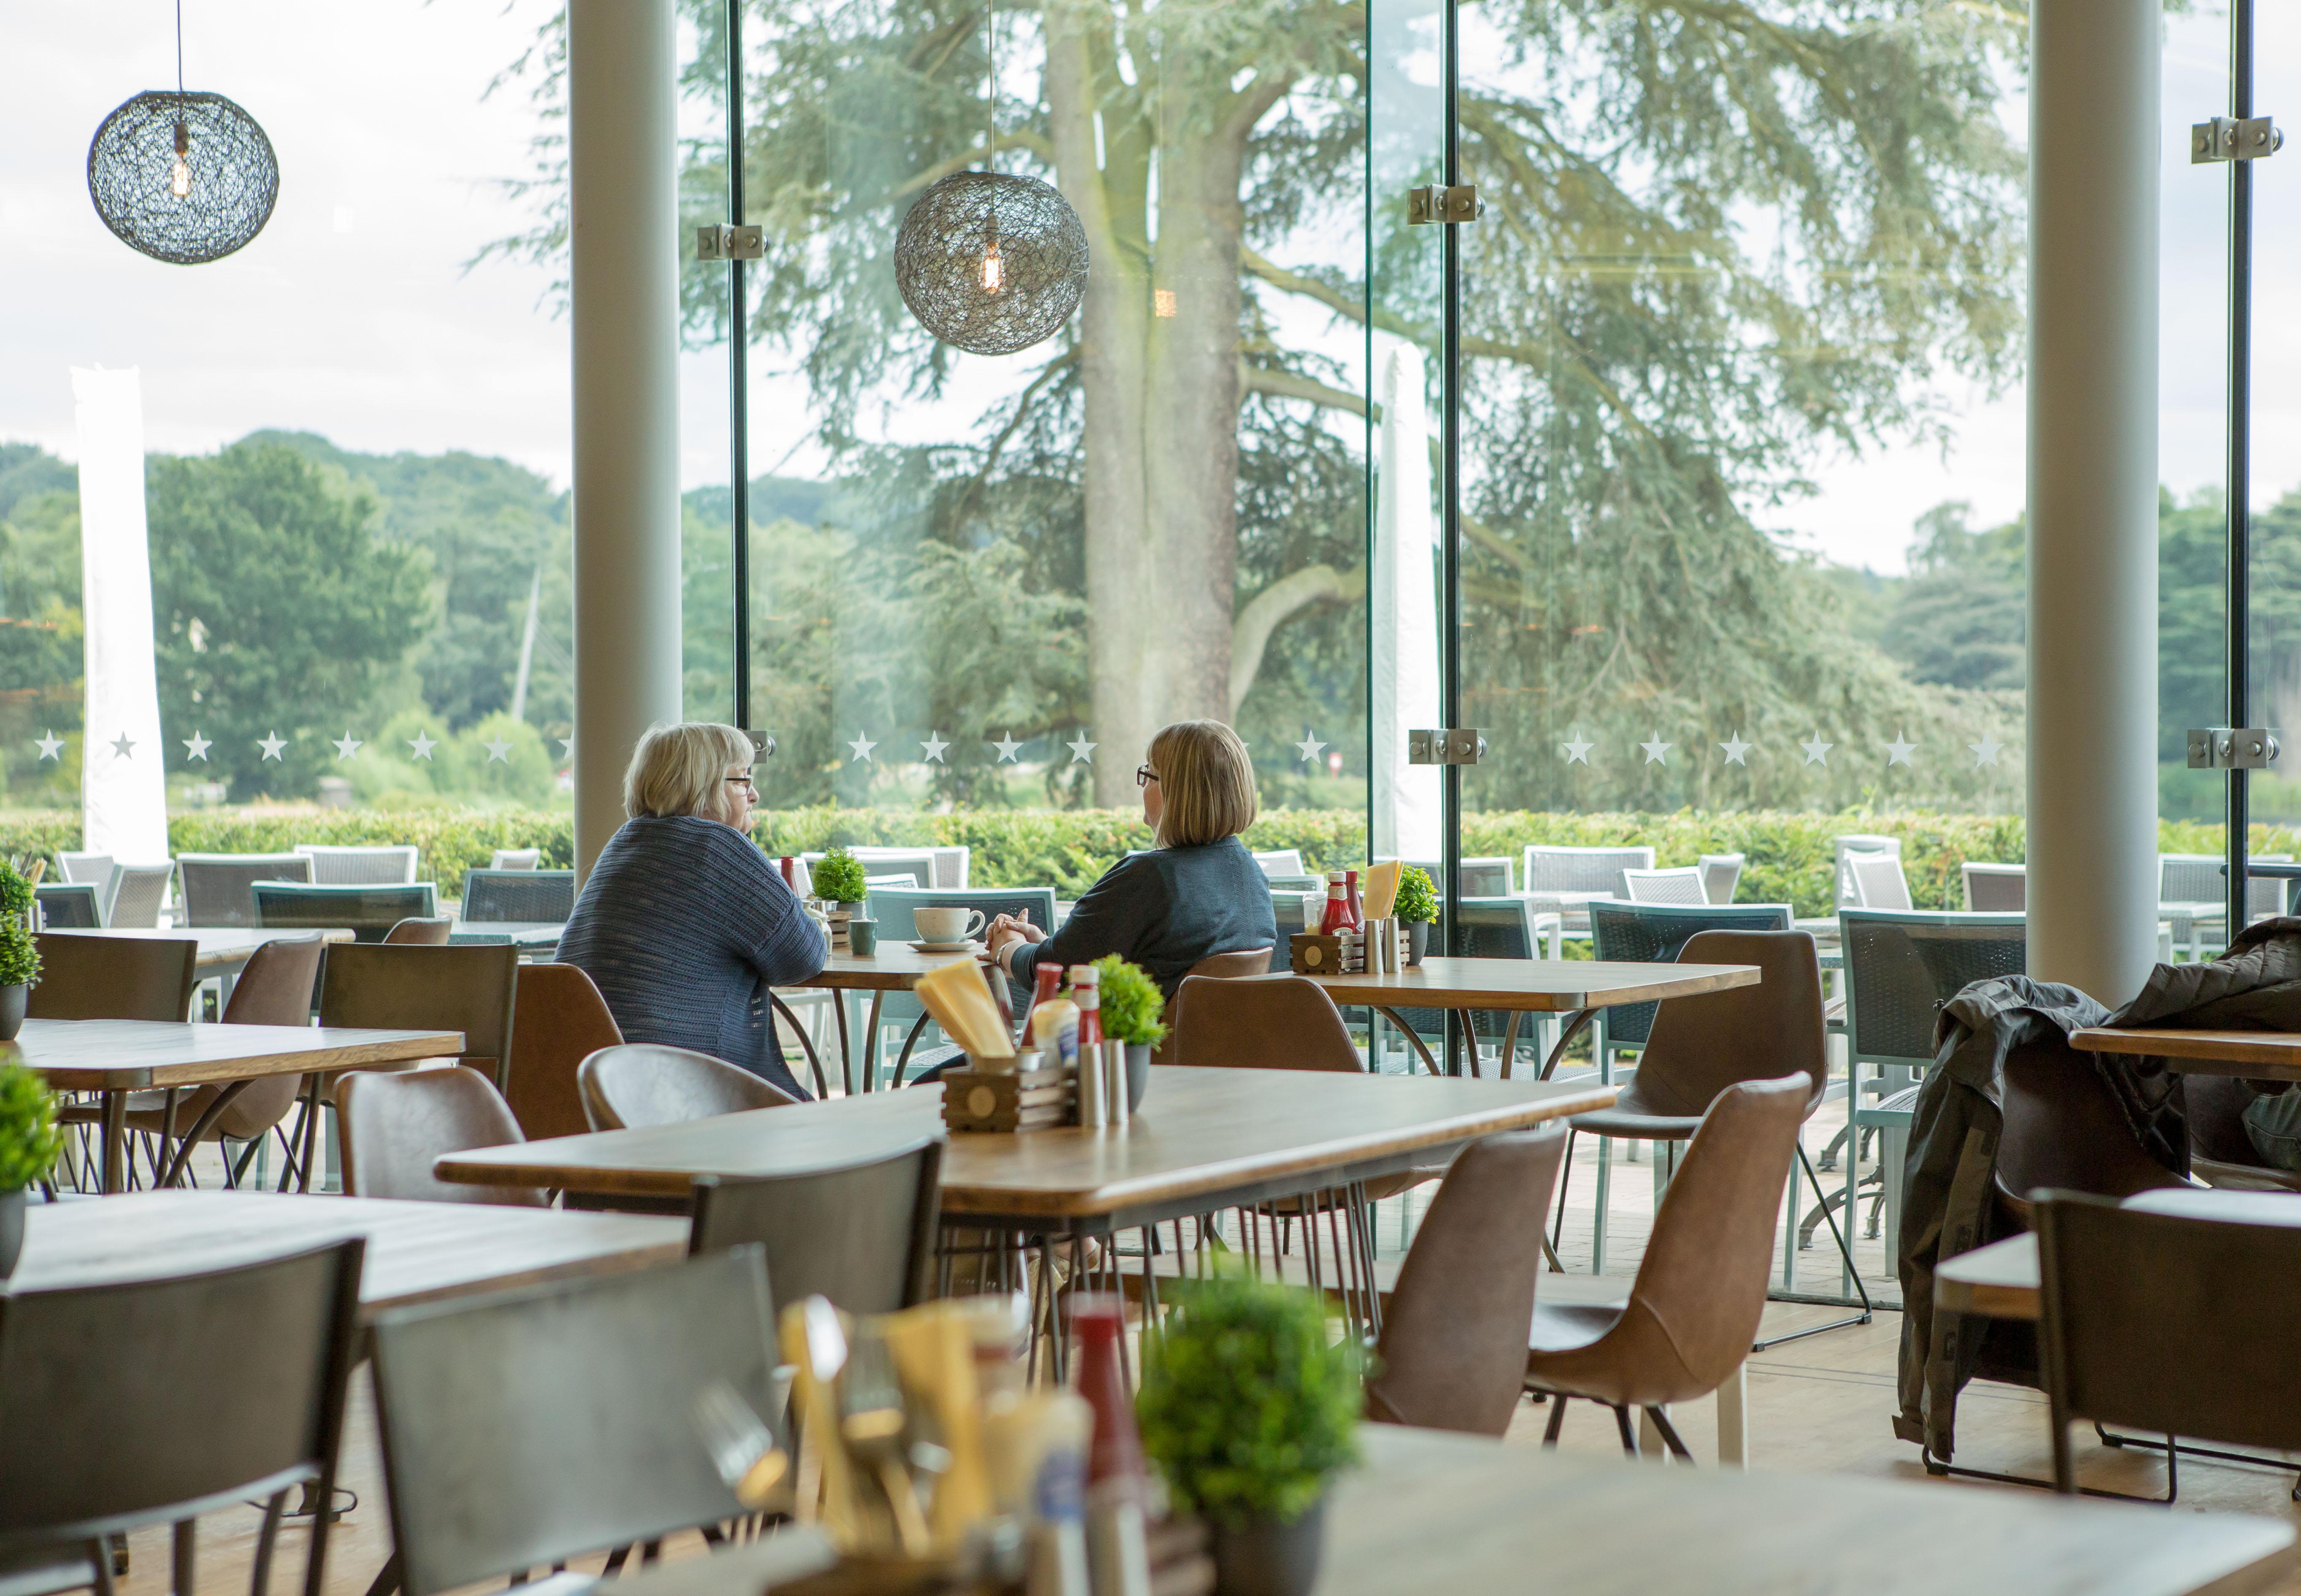 Italian Gardens Tearoom Interior New Updated 6 1